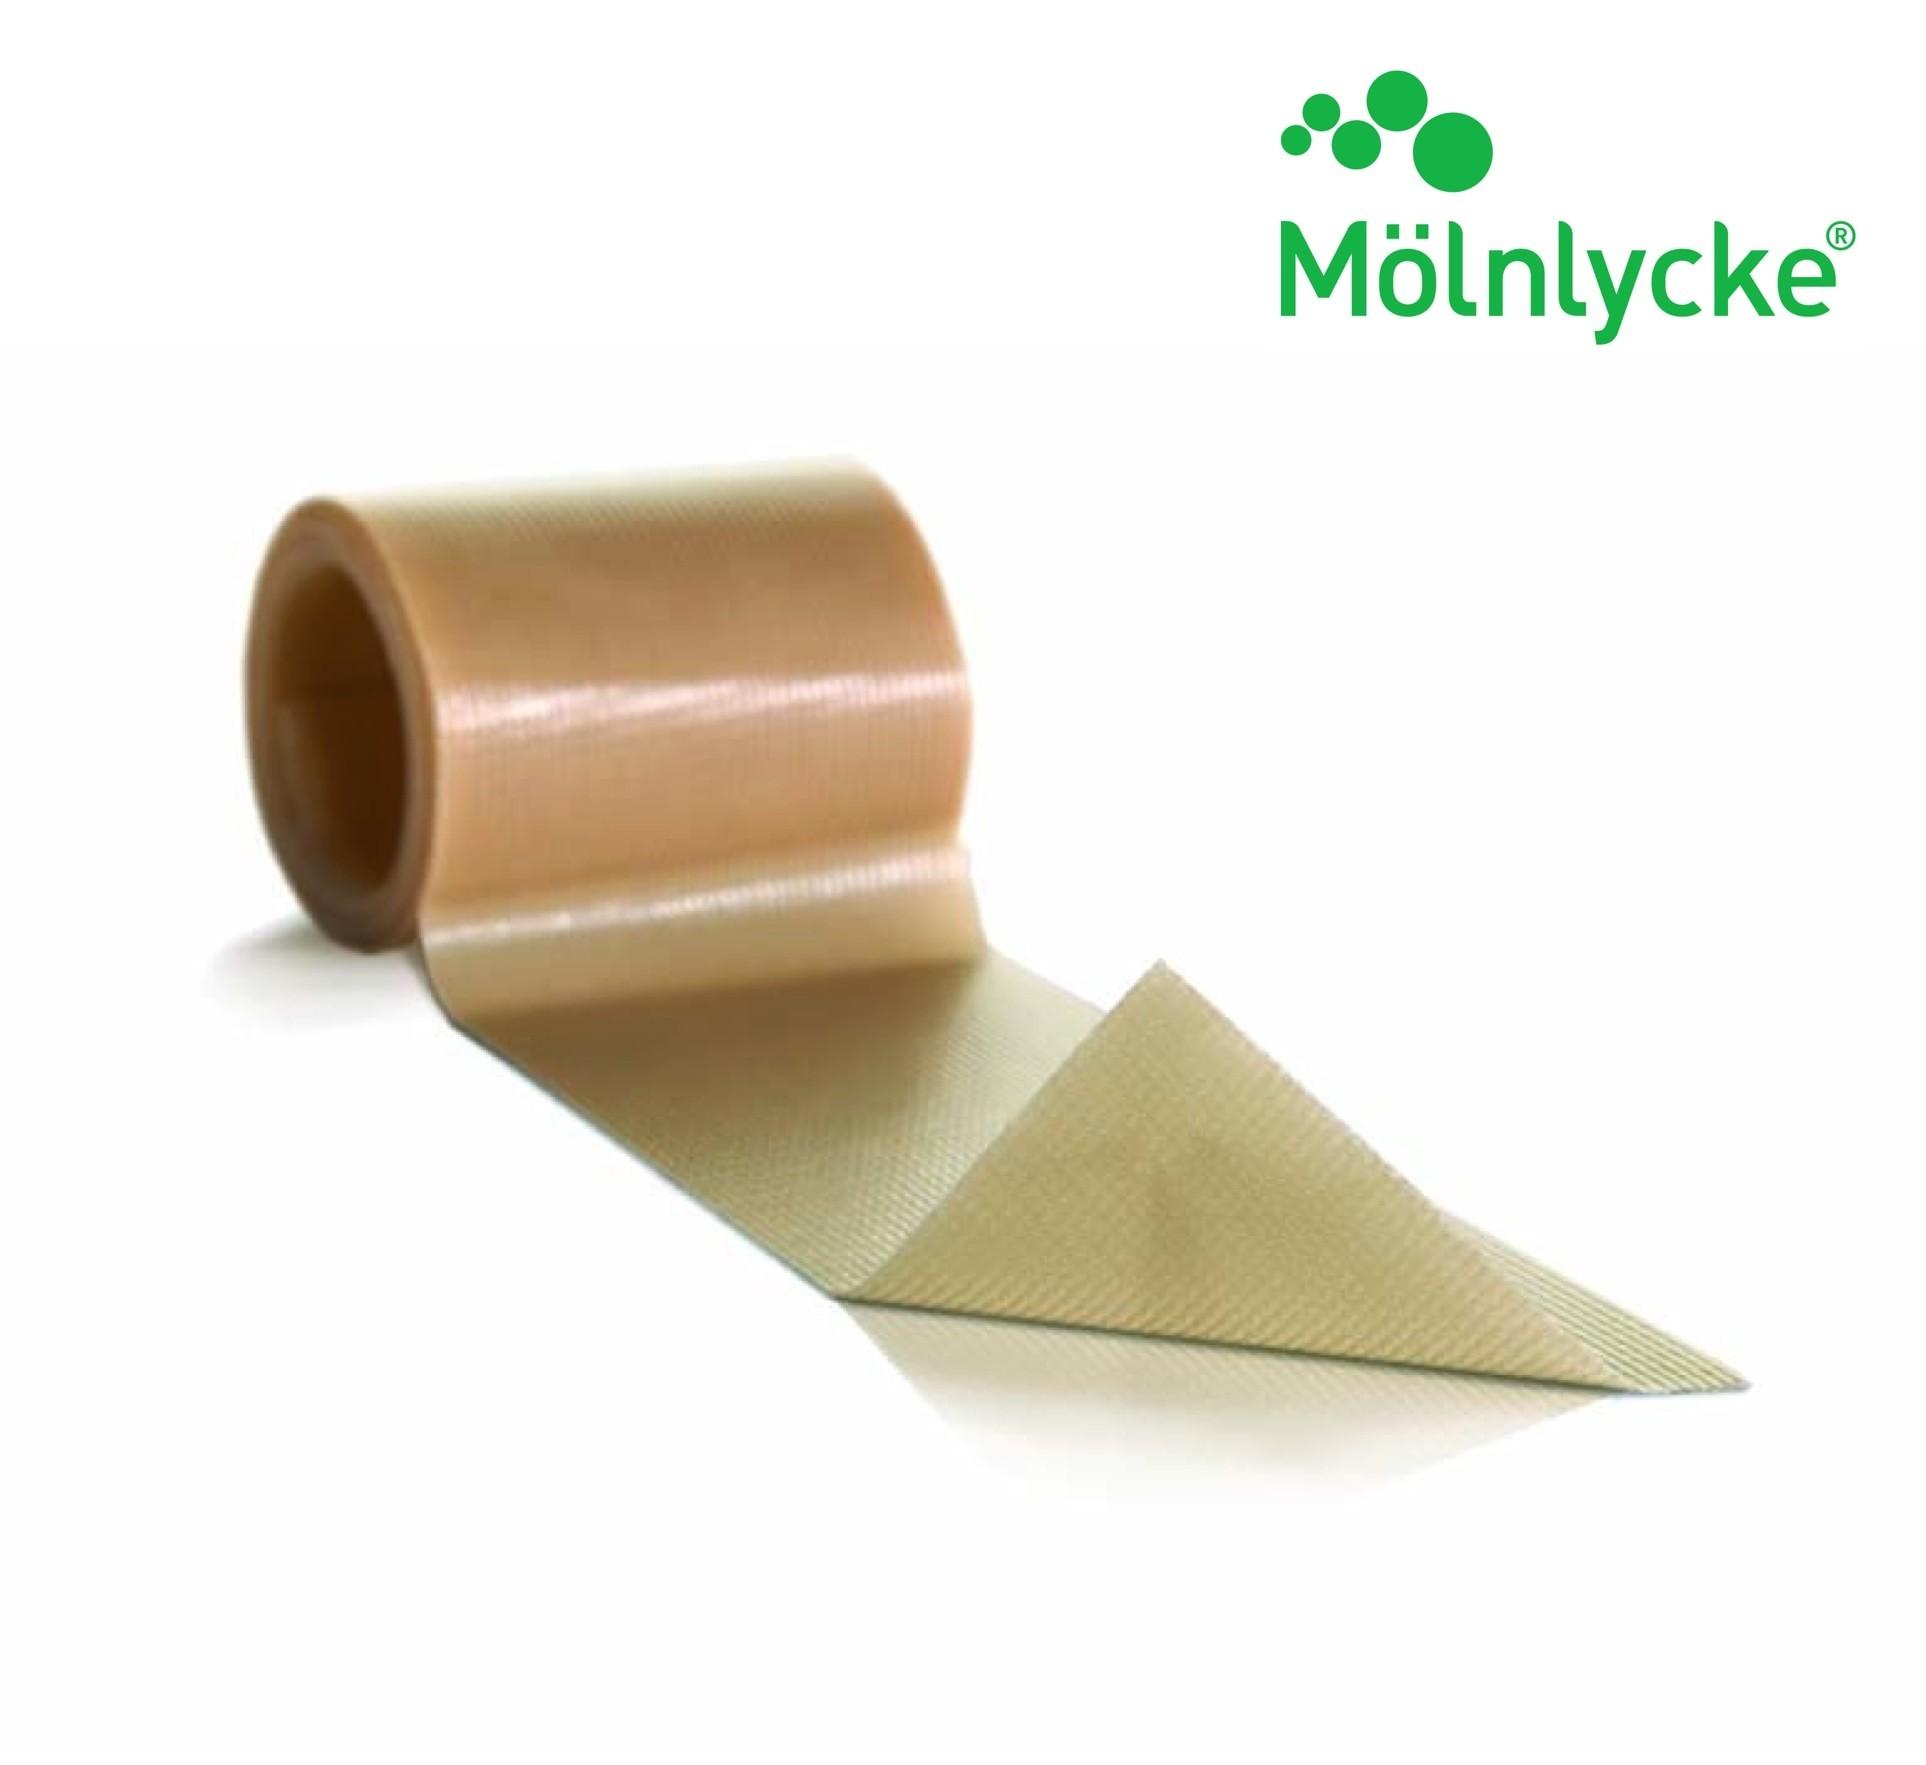 Мепитак (Mepitac) 2см х 3м, 5 шт в упаковке